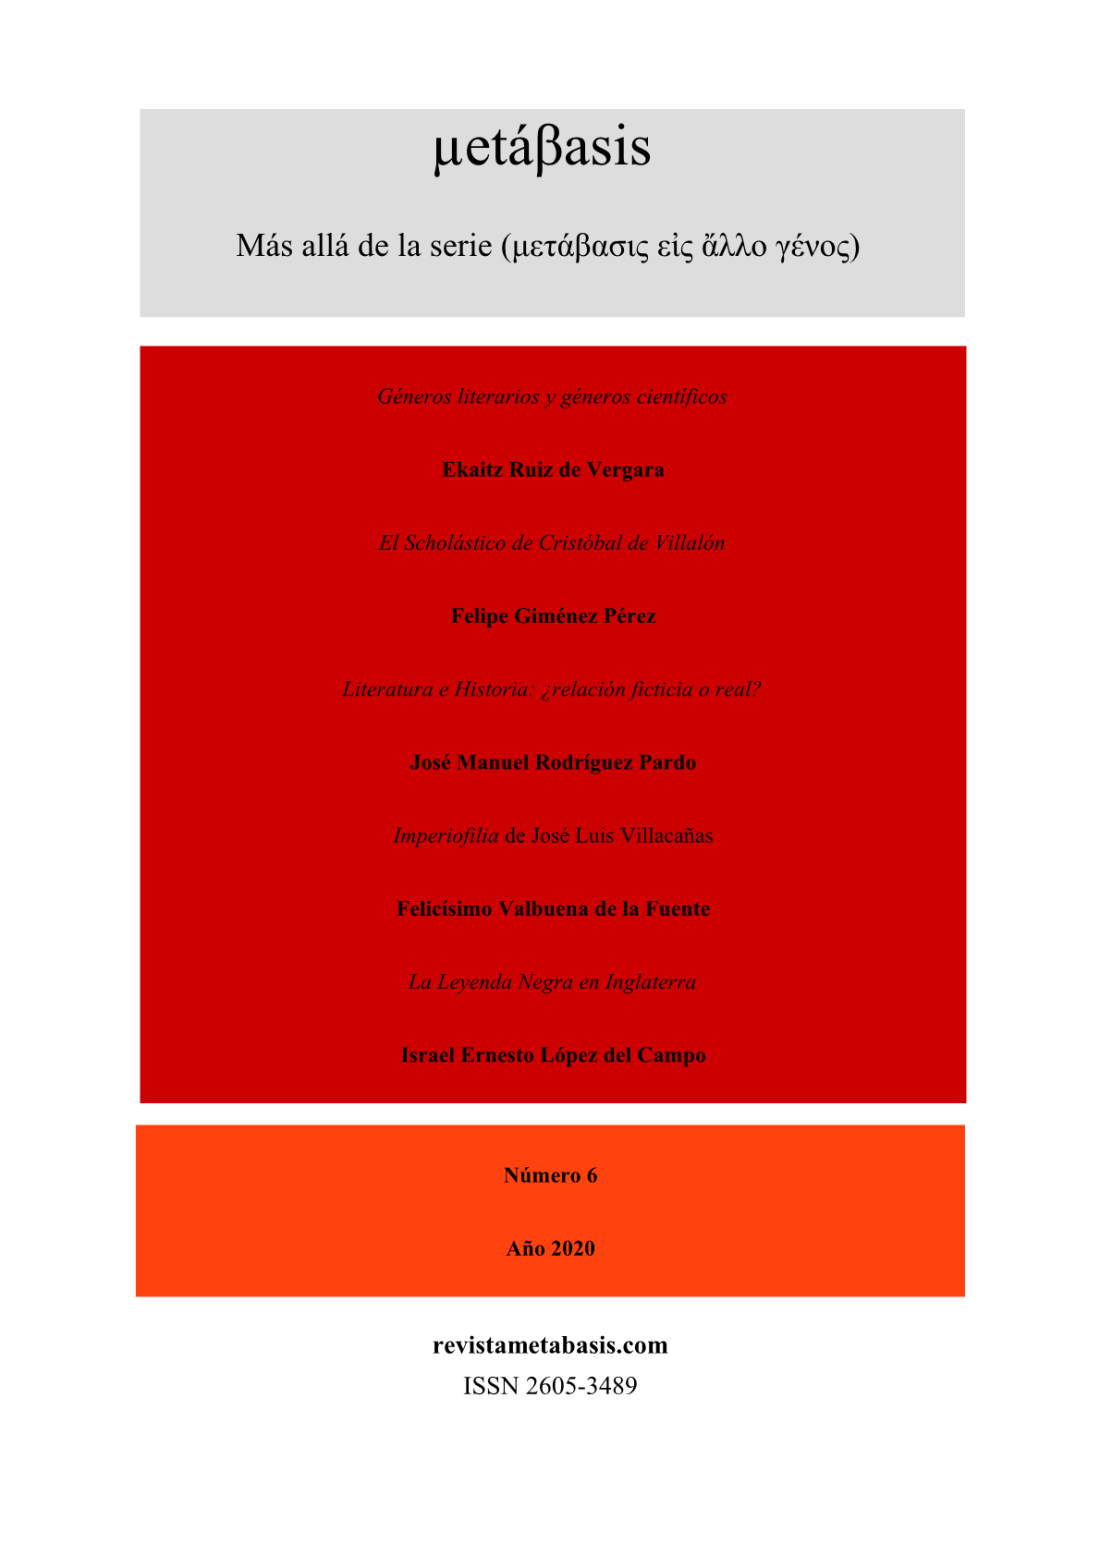 Revista Metábasis Número 6 (2020) Tapa 21